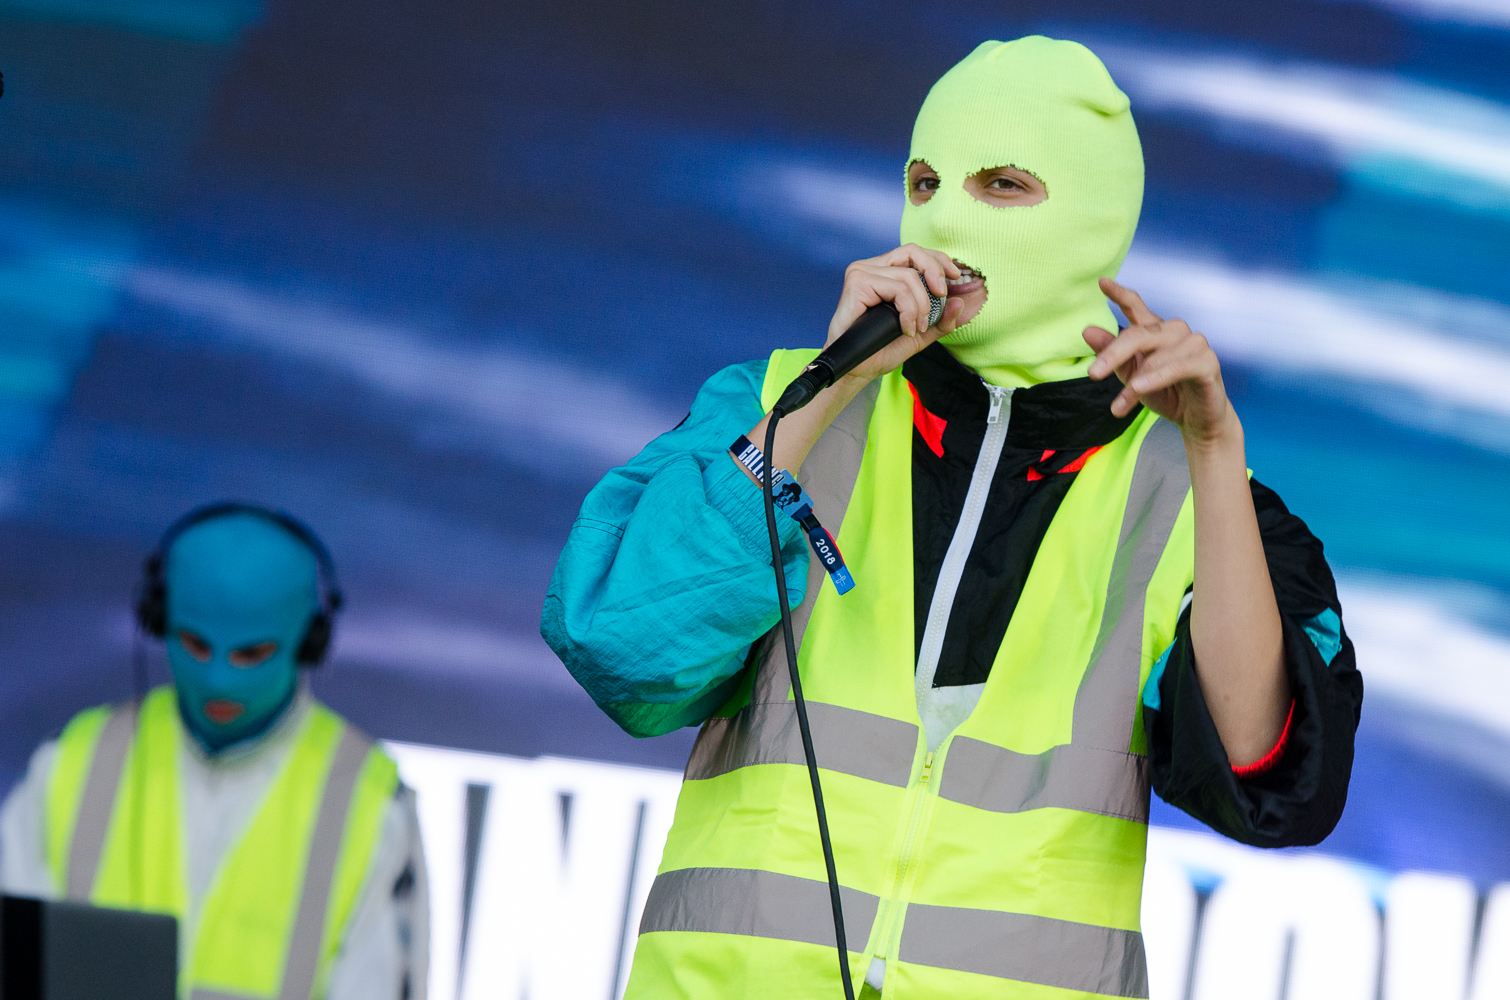 boston calling ben kaye pussy riot 6 Perry Farrell announces new solo album, shares Origins of lead single Pirate Punk Politician: Stream